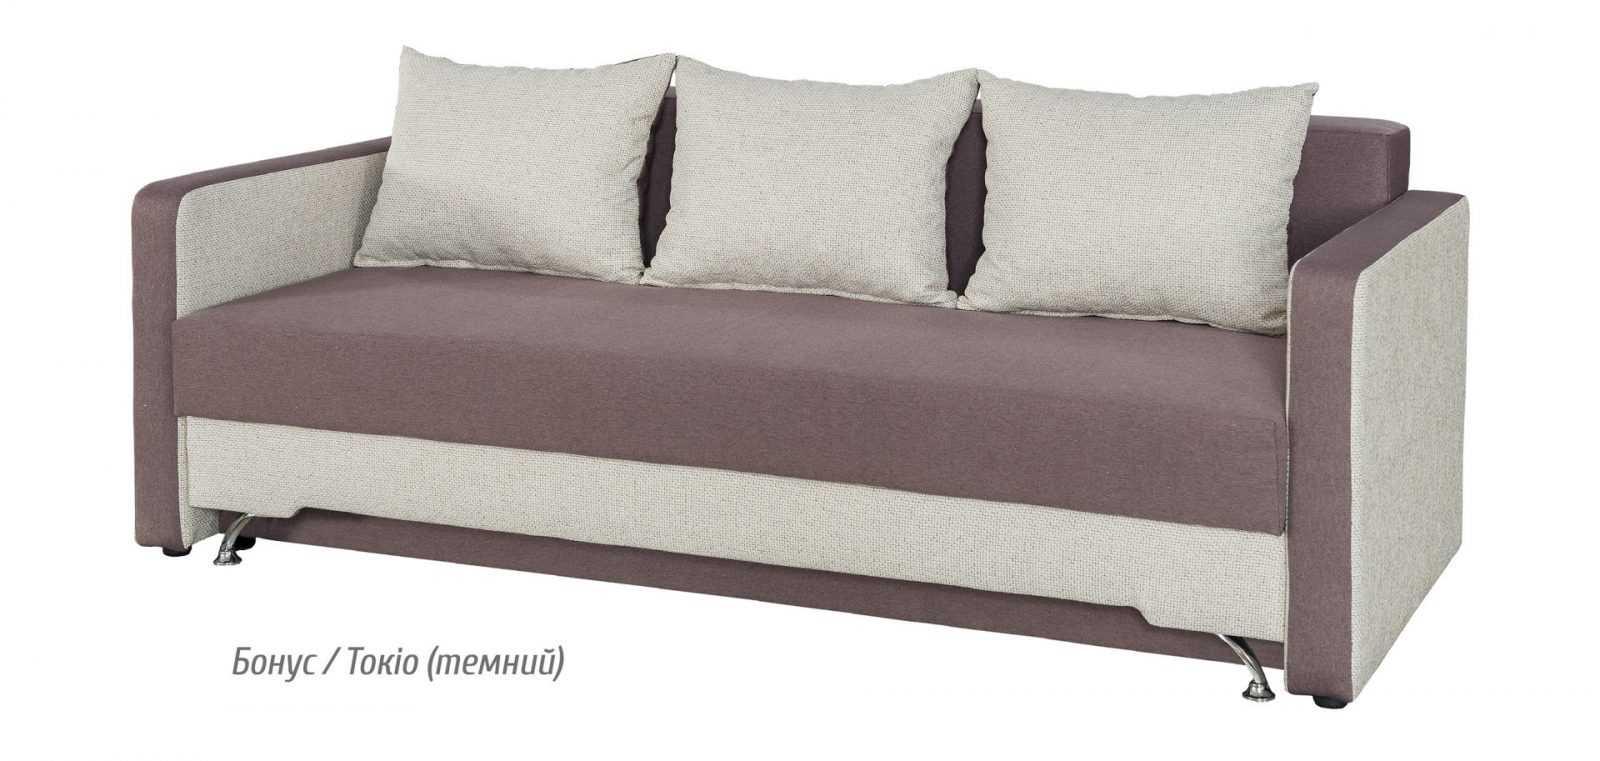 Лира new диван раскладной